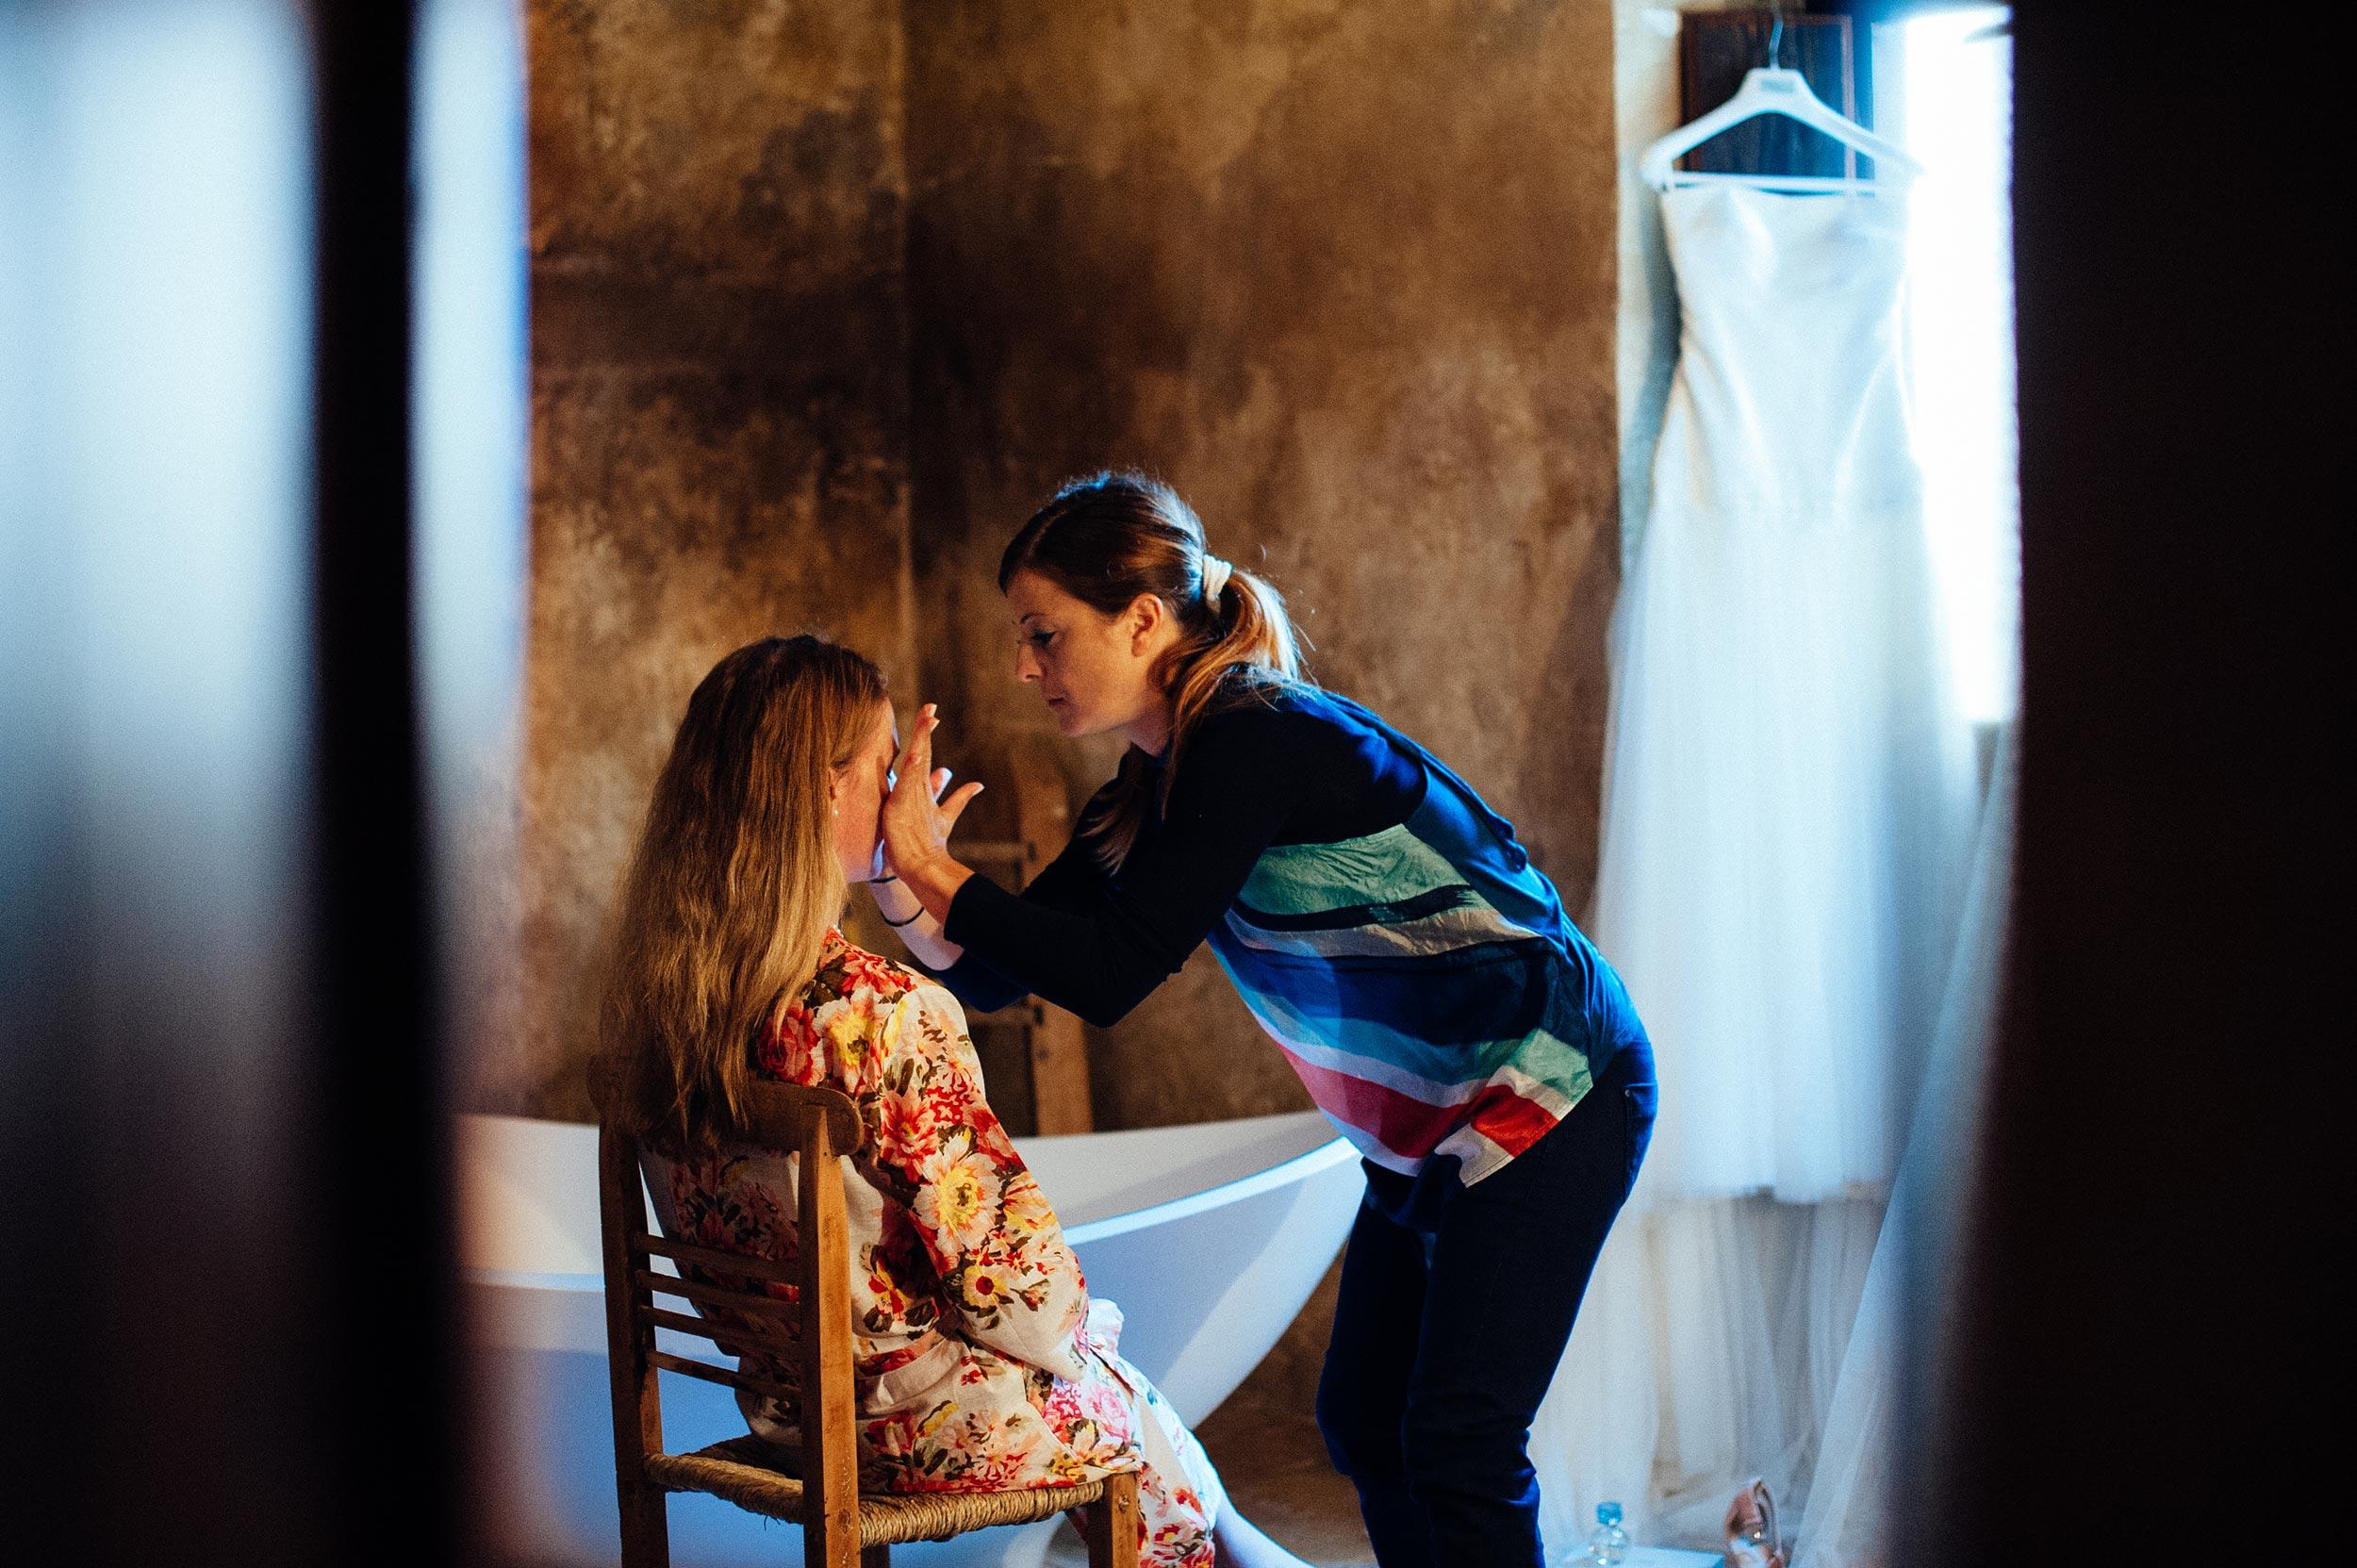 2014-Shelby-Jocelyn-Santo-Stefano-Di-Sessanio-Wedding-Photographer-Italy-Alessandro-Avenali-1.jpg